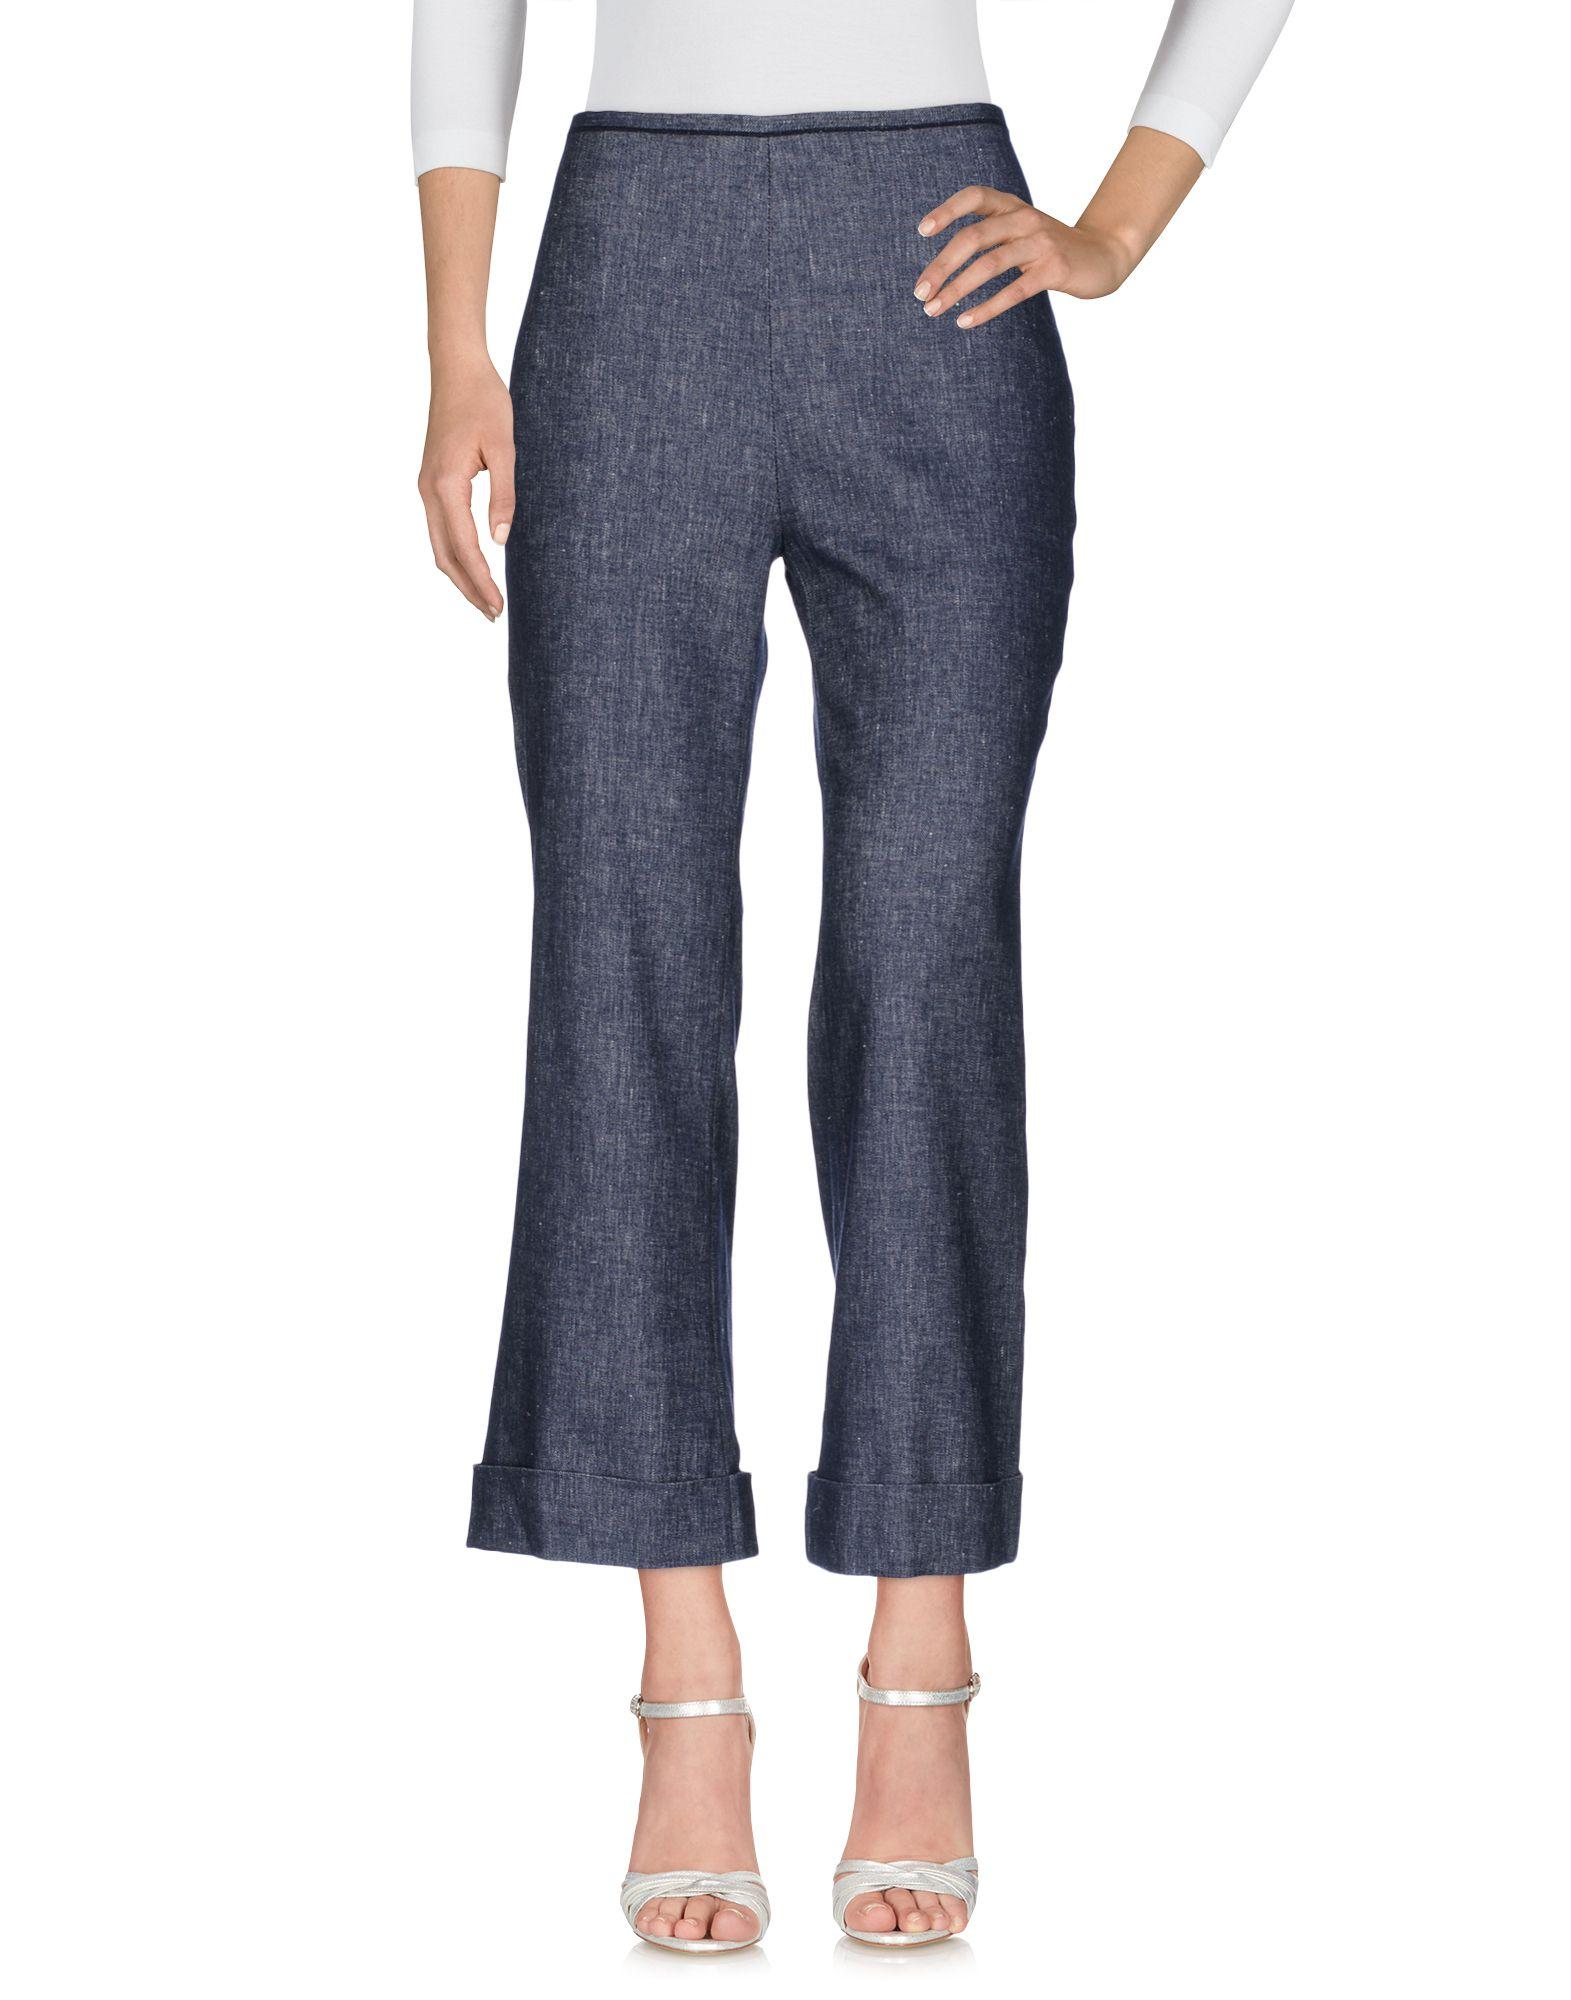 Pantaloni Jeans Collection Privēe? Donna - Acquista online su G32nBy